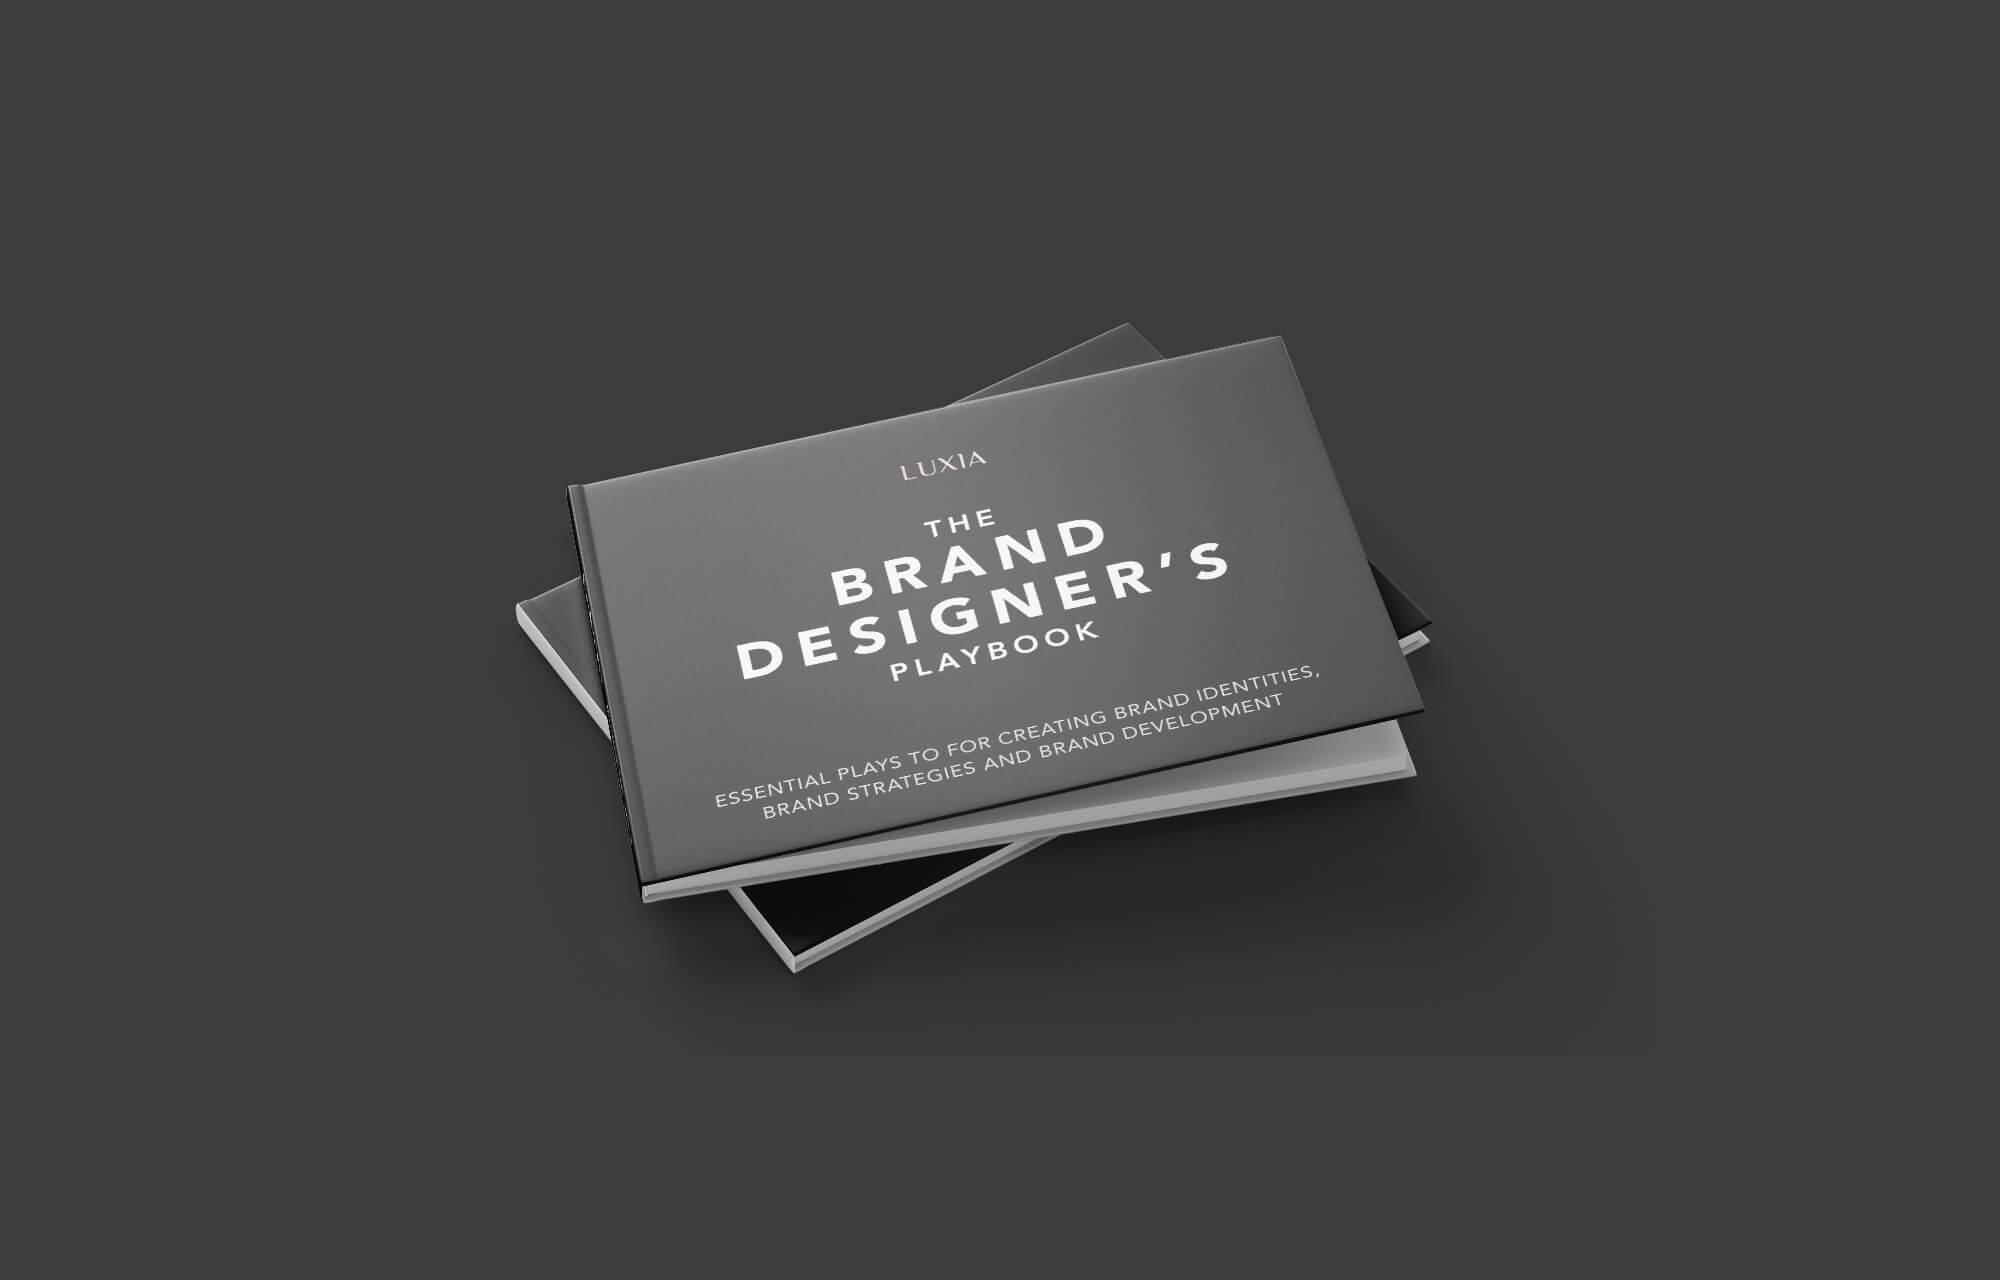 Brand Designer's Playbook